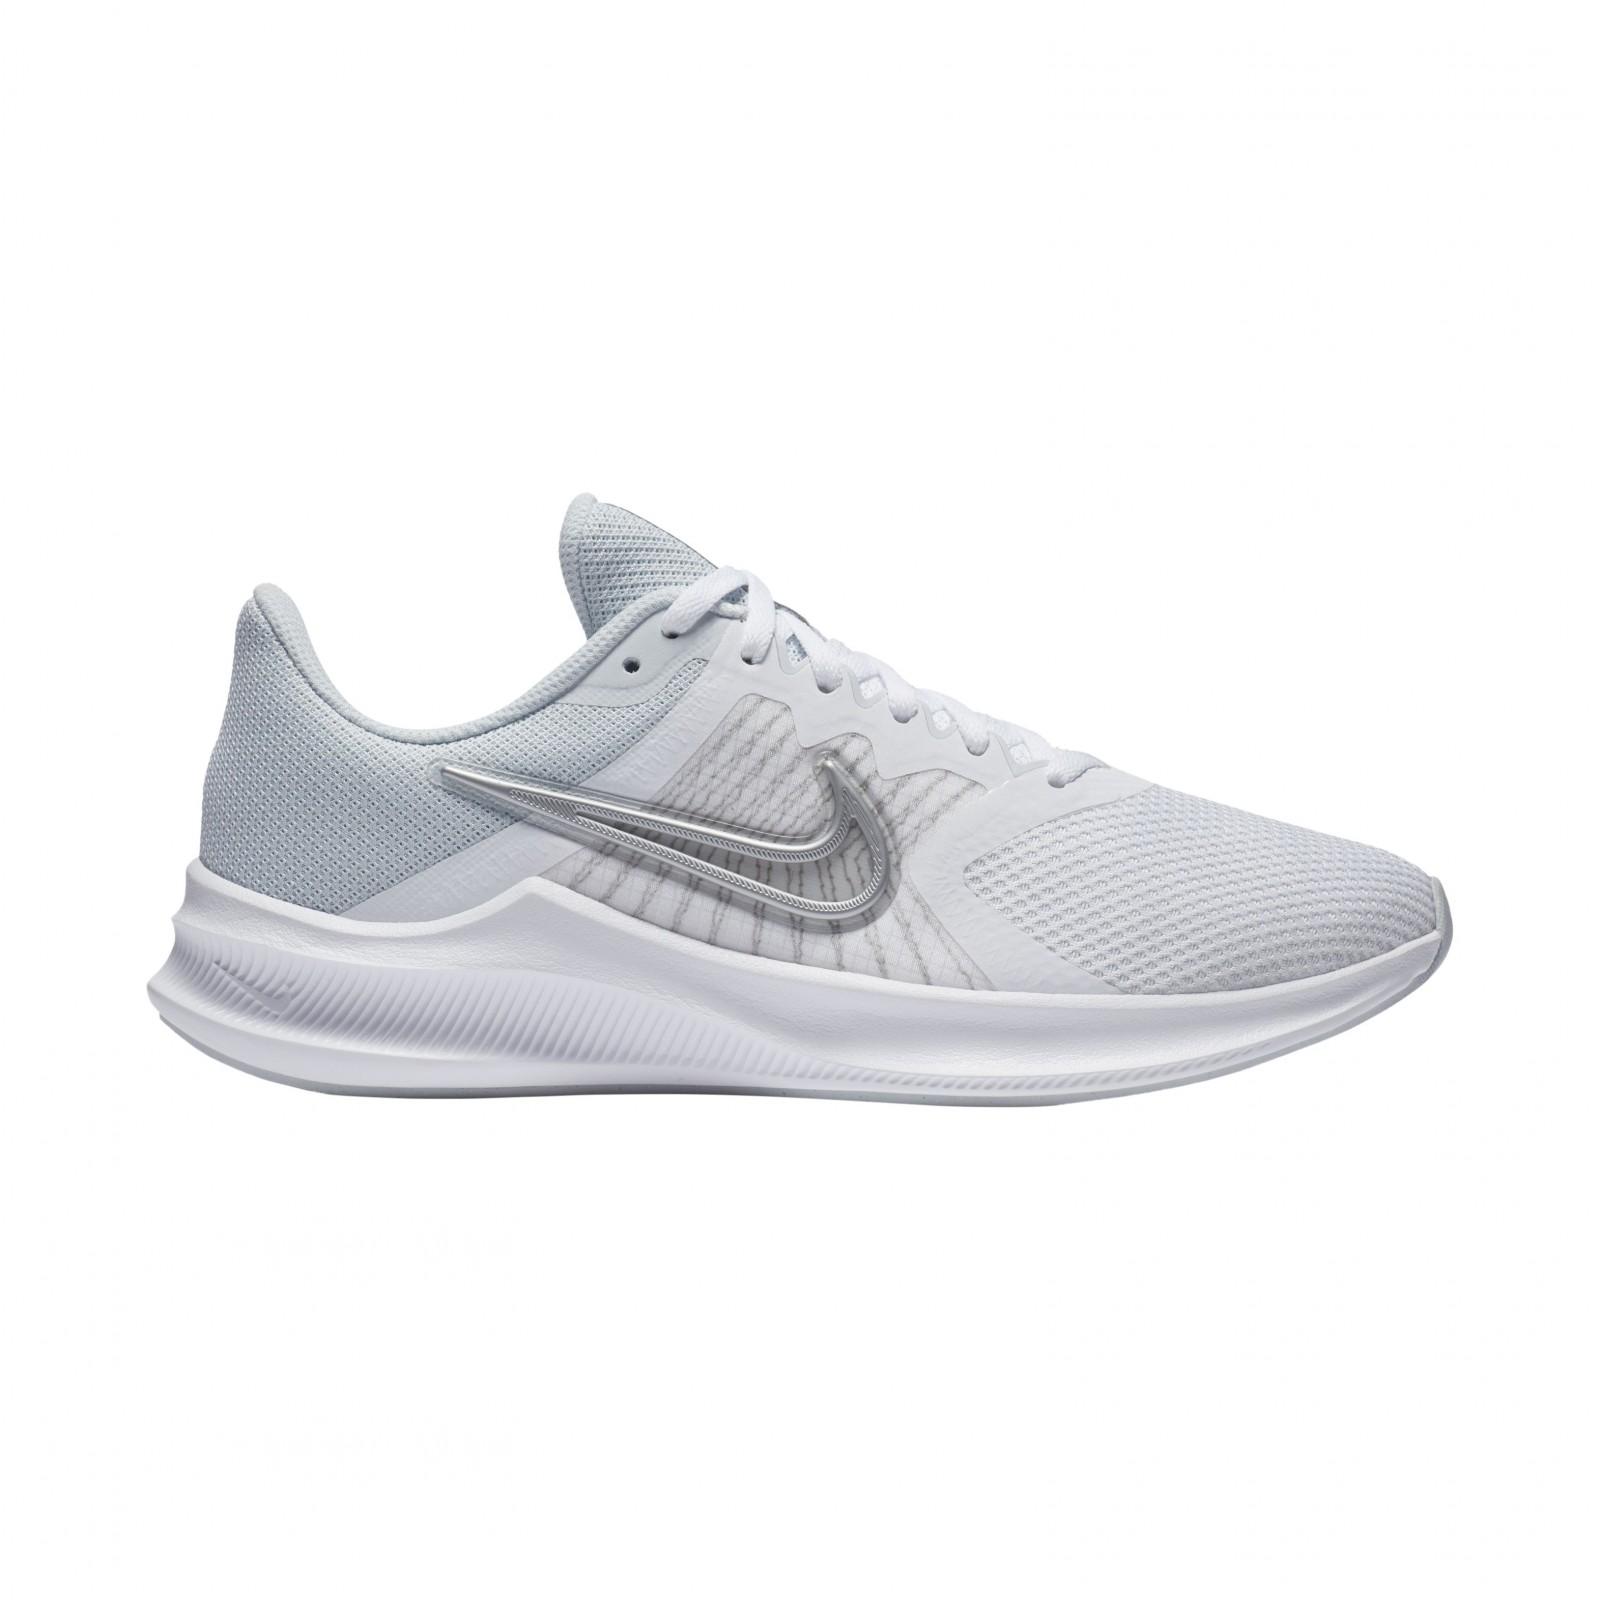 Nike Downshifter 11 WHITE/METALLIC SILVER-PURE PLATINUM